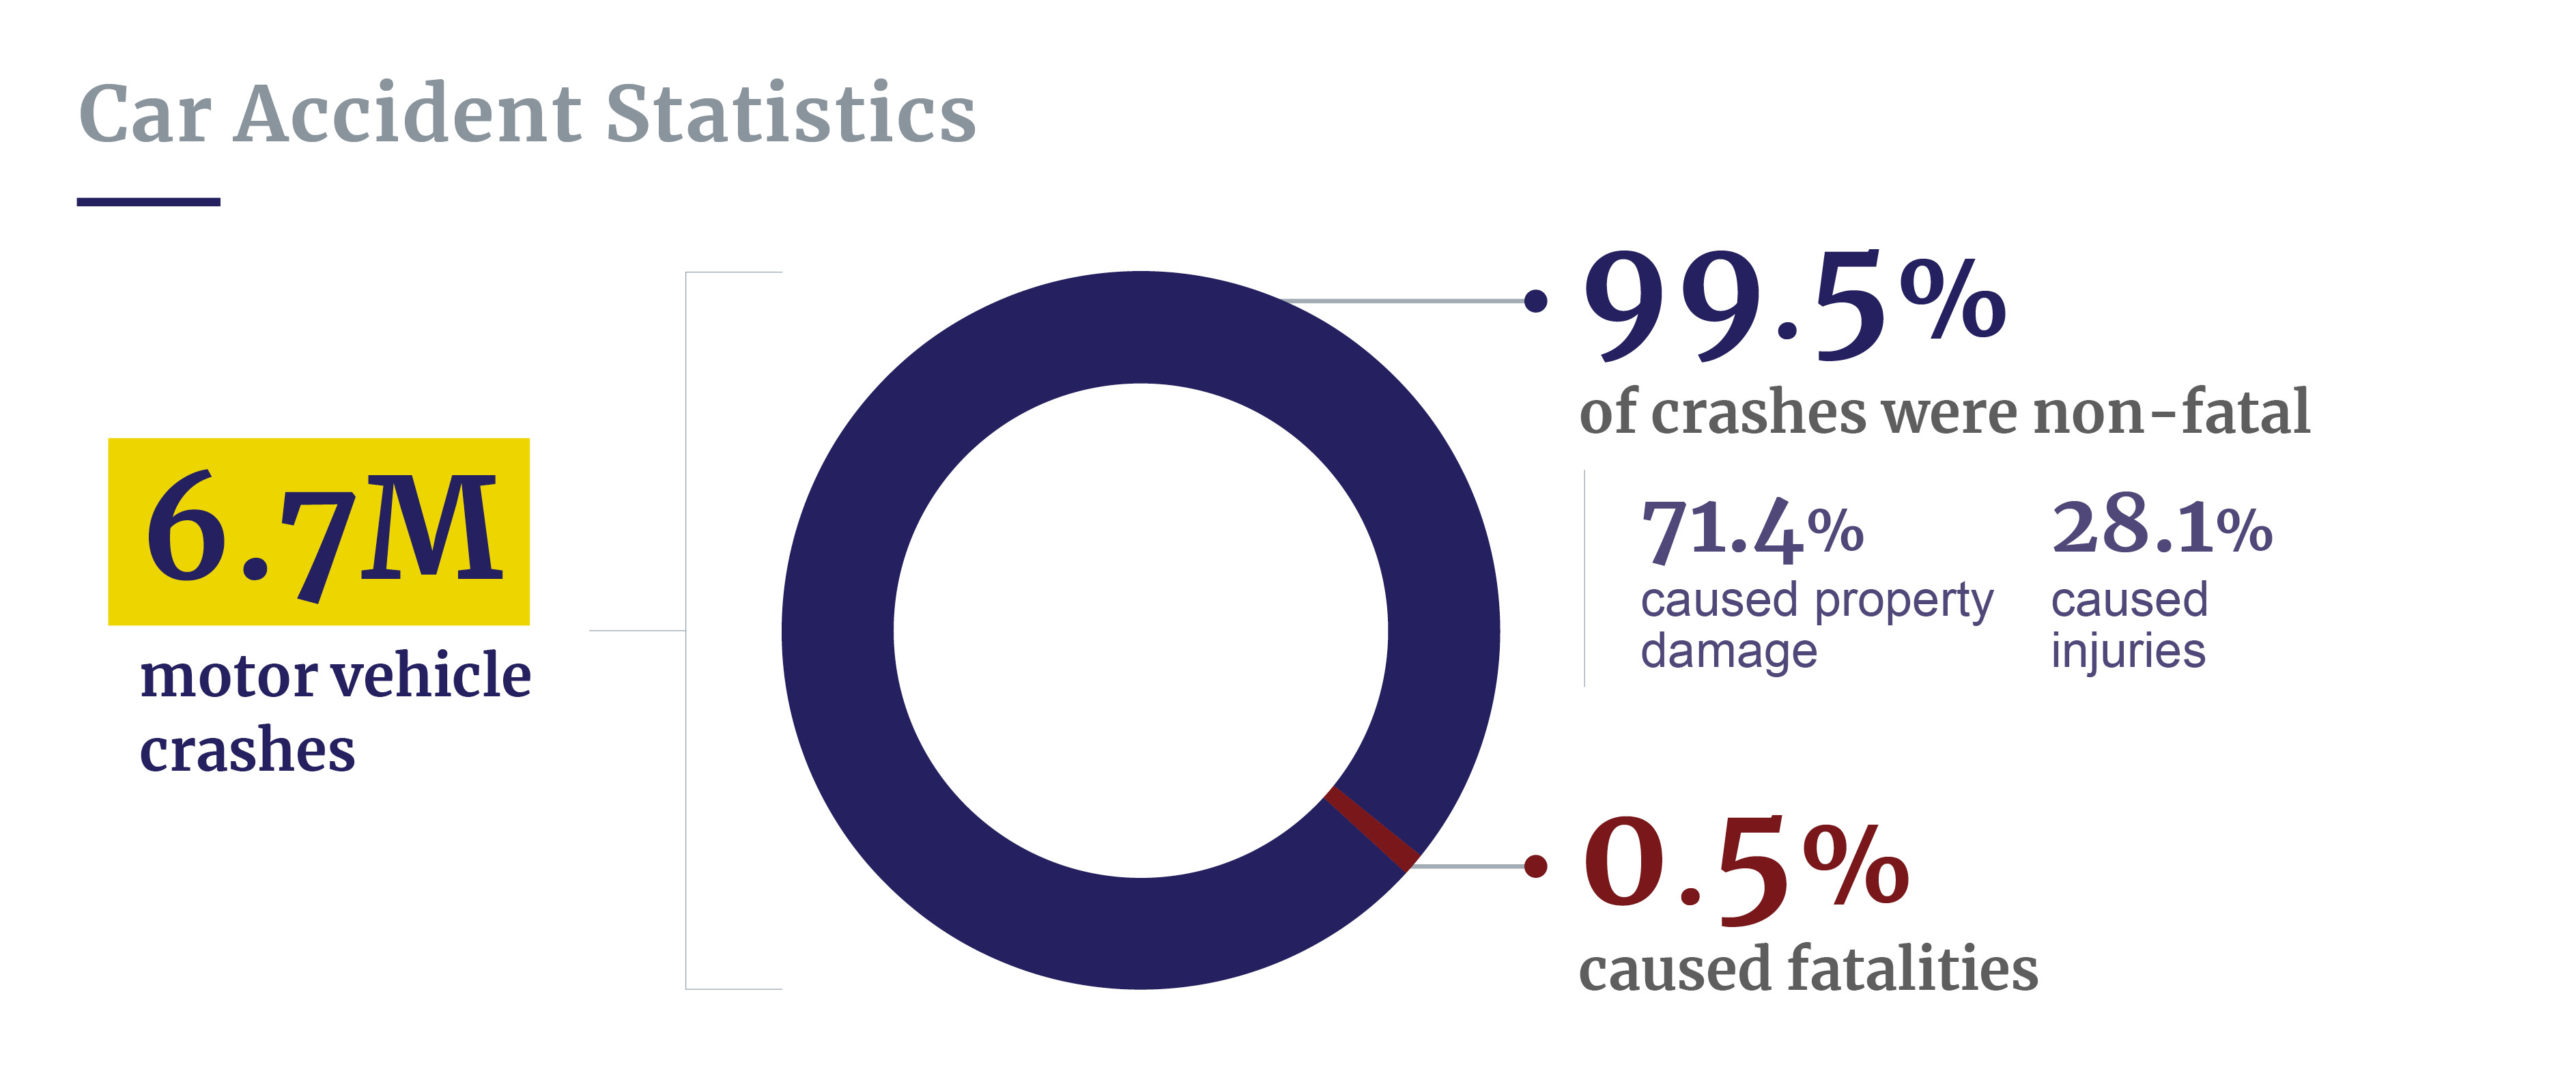 Car accident statistics breakdown